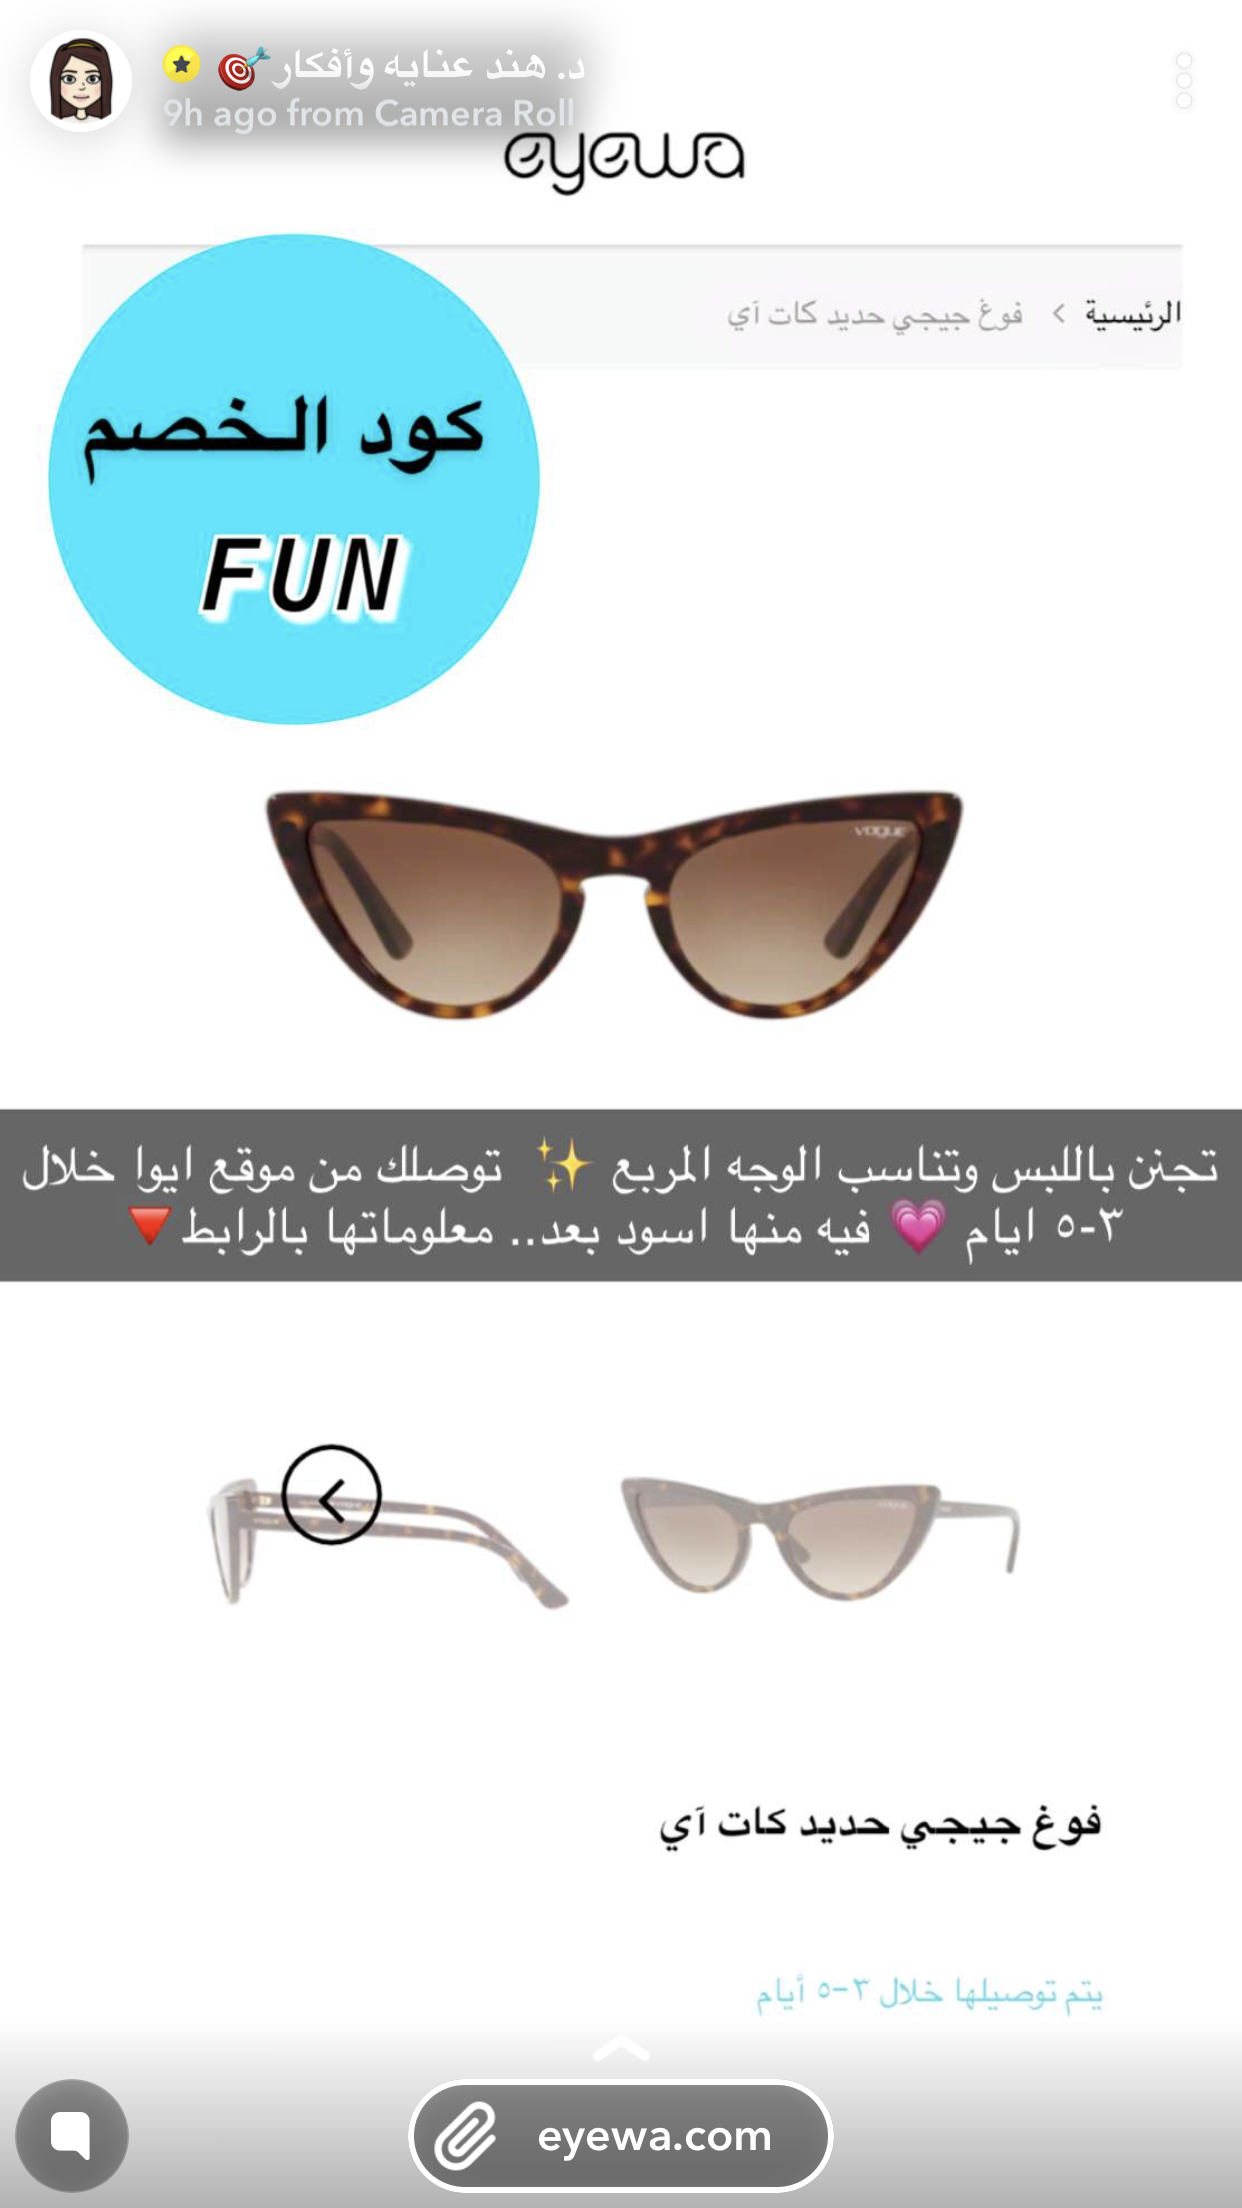 Pin By Jin Hyun On د هند عناية و افكار Glasses Sunglasses Fashion